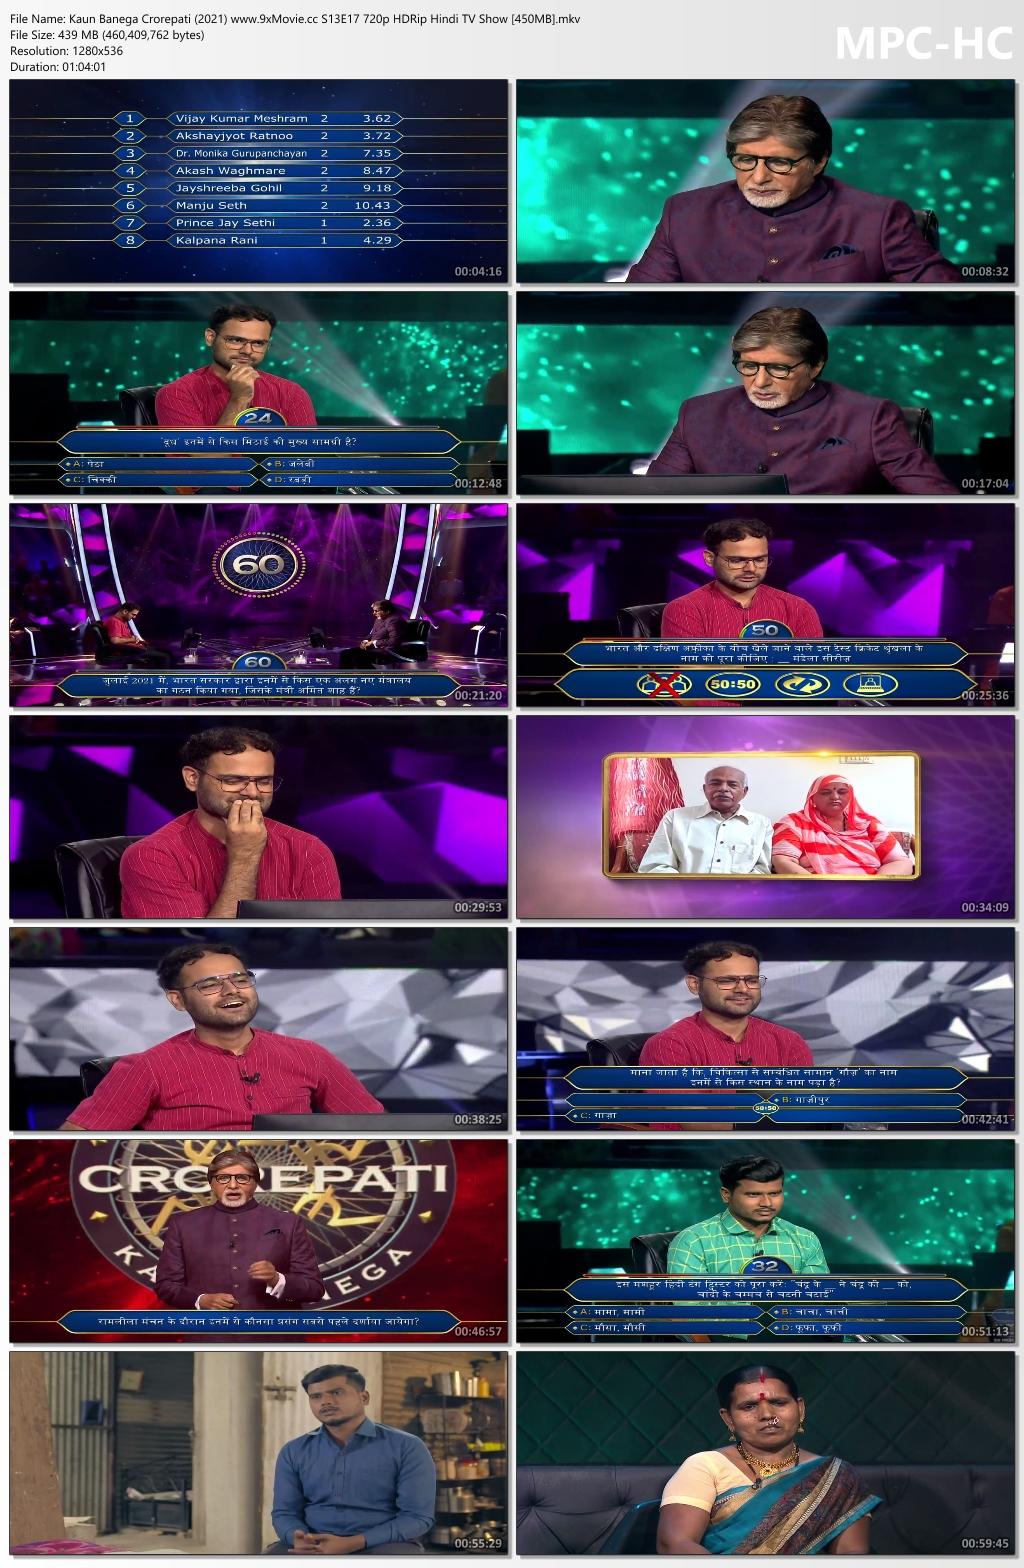 Kaun-Banega-Crorepati-2021-www-9x-Movie-cc-S13-E17-720p-HDRip-Hindi-TV-Show-450-MB-mkv